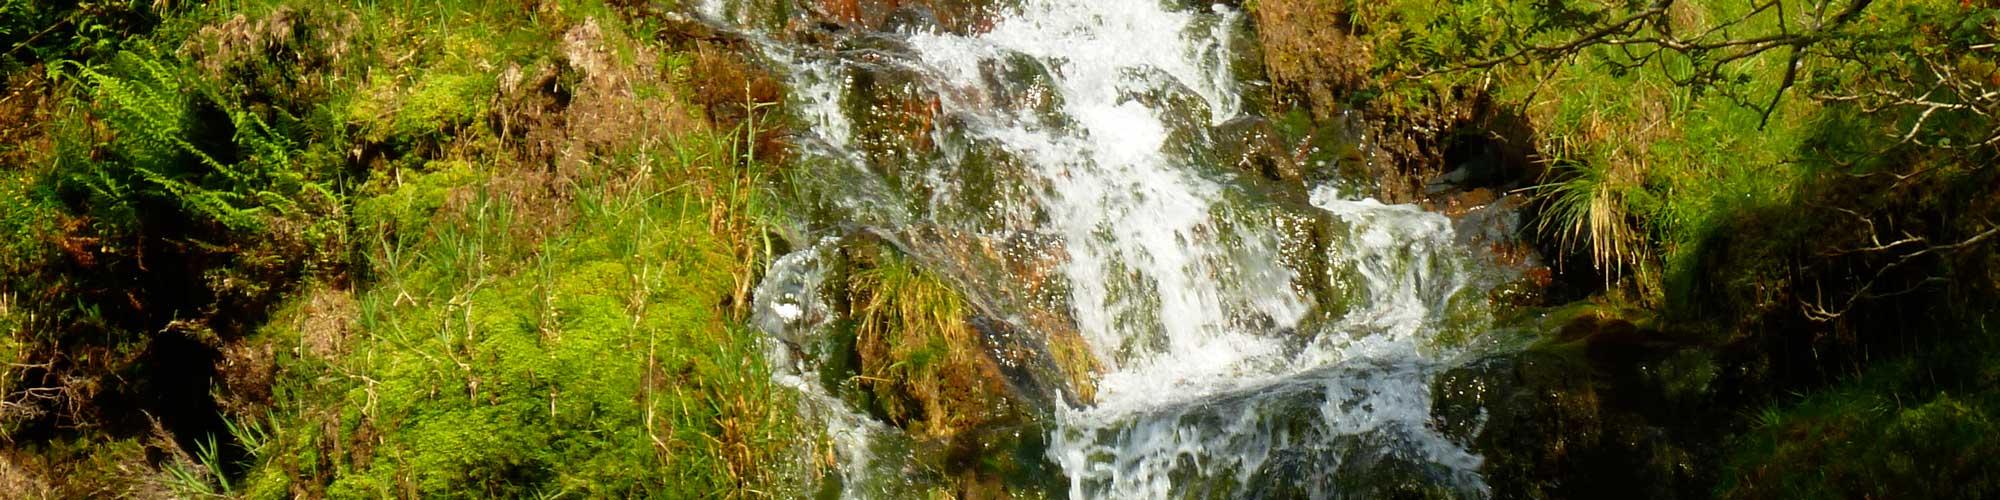 waterfall at poppycottage